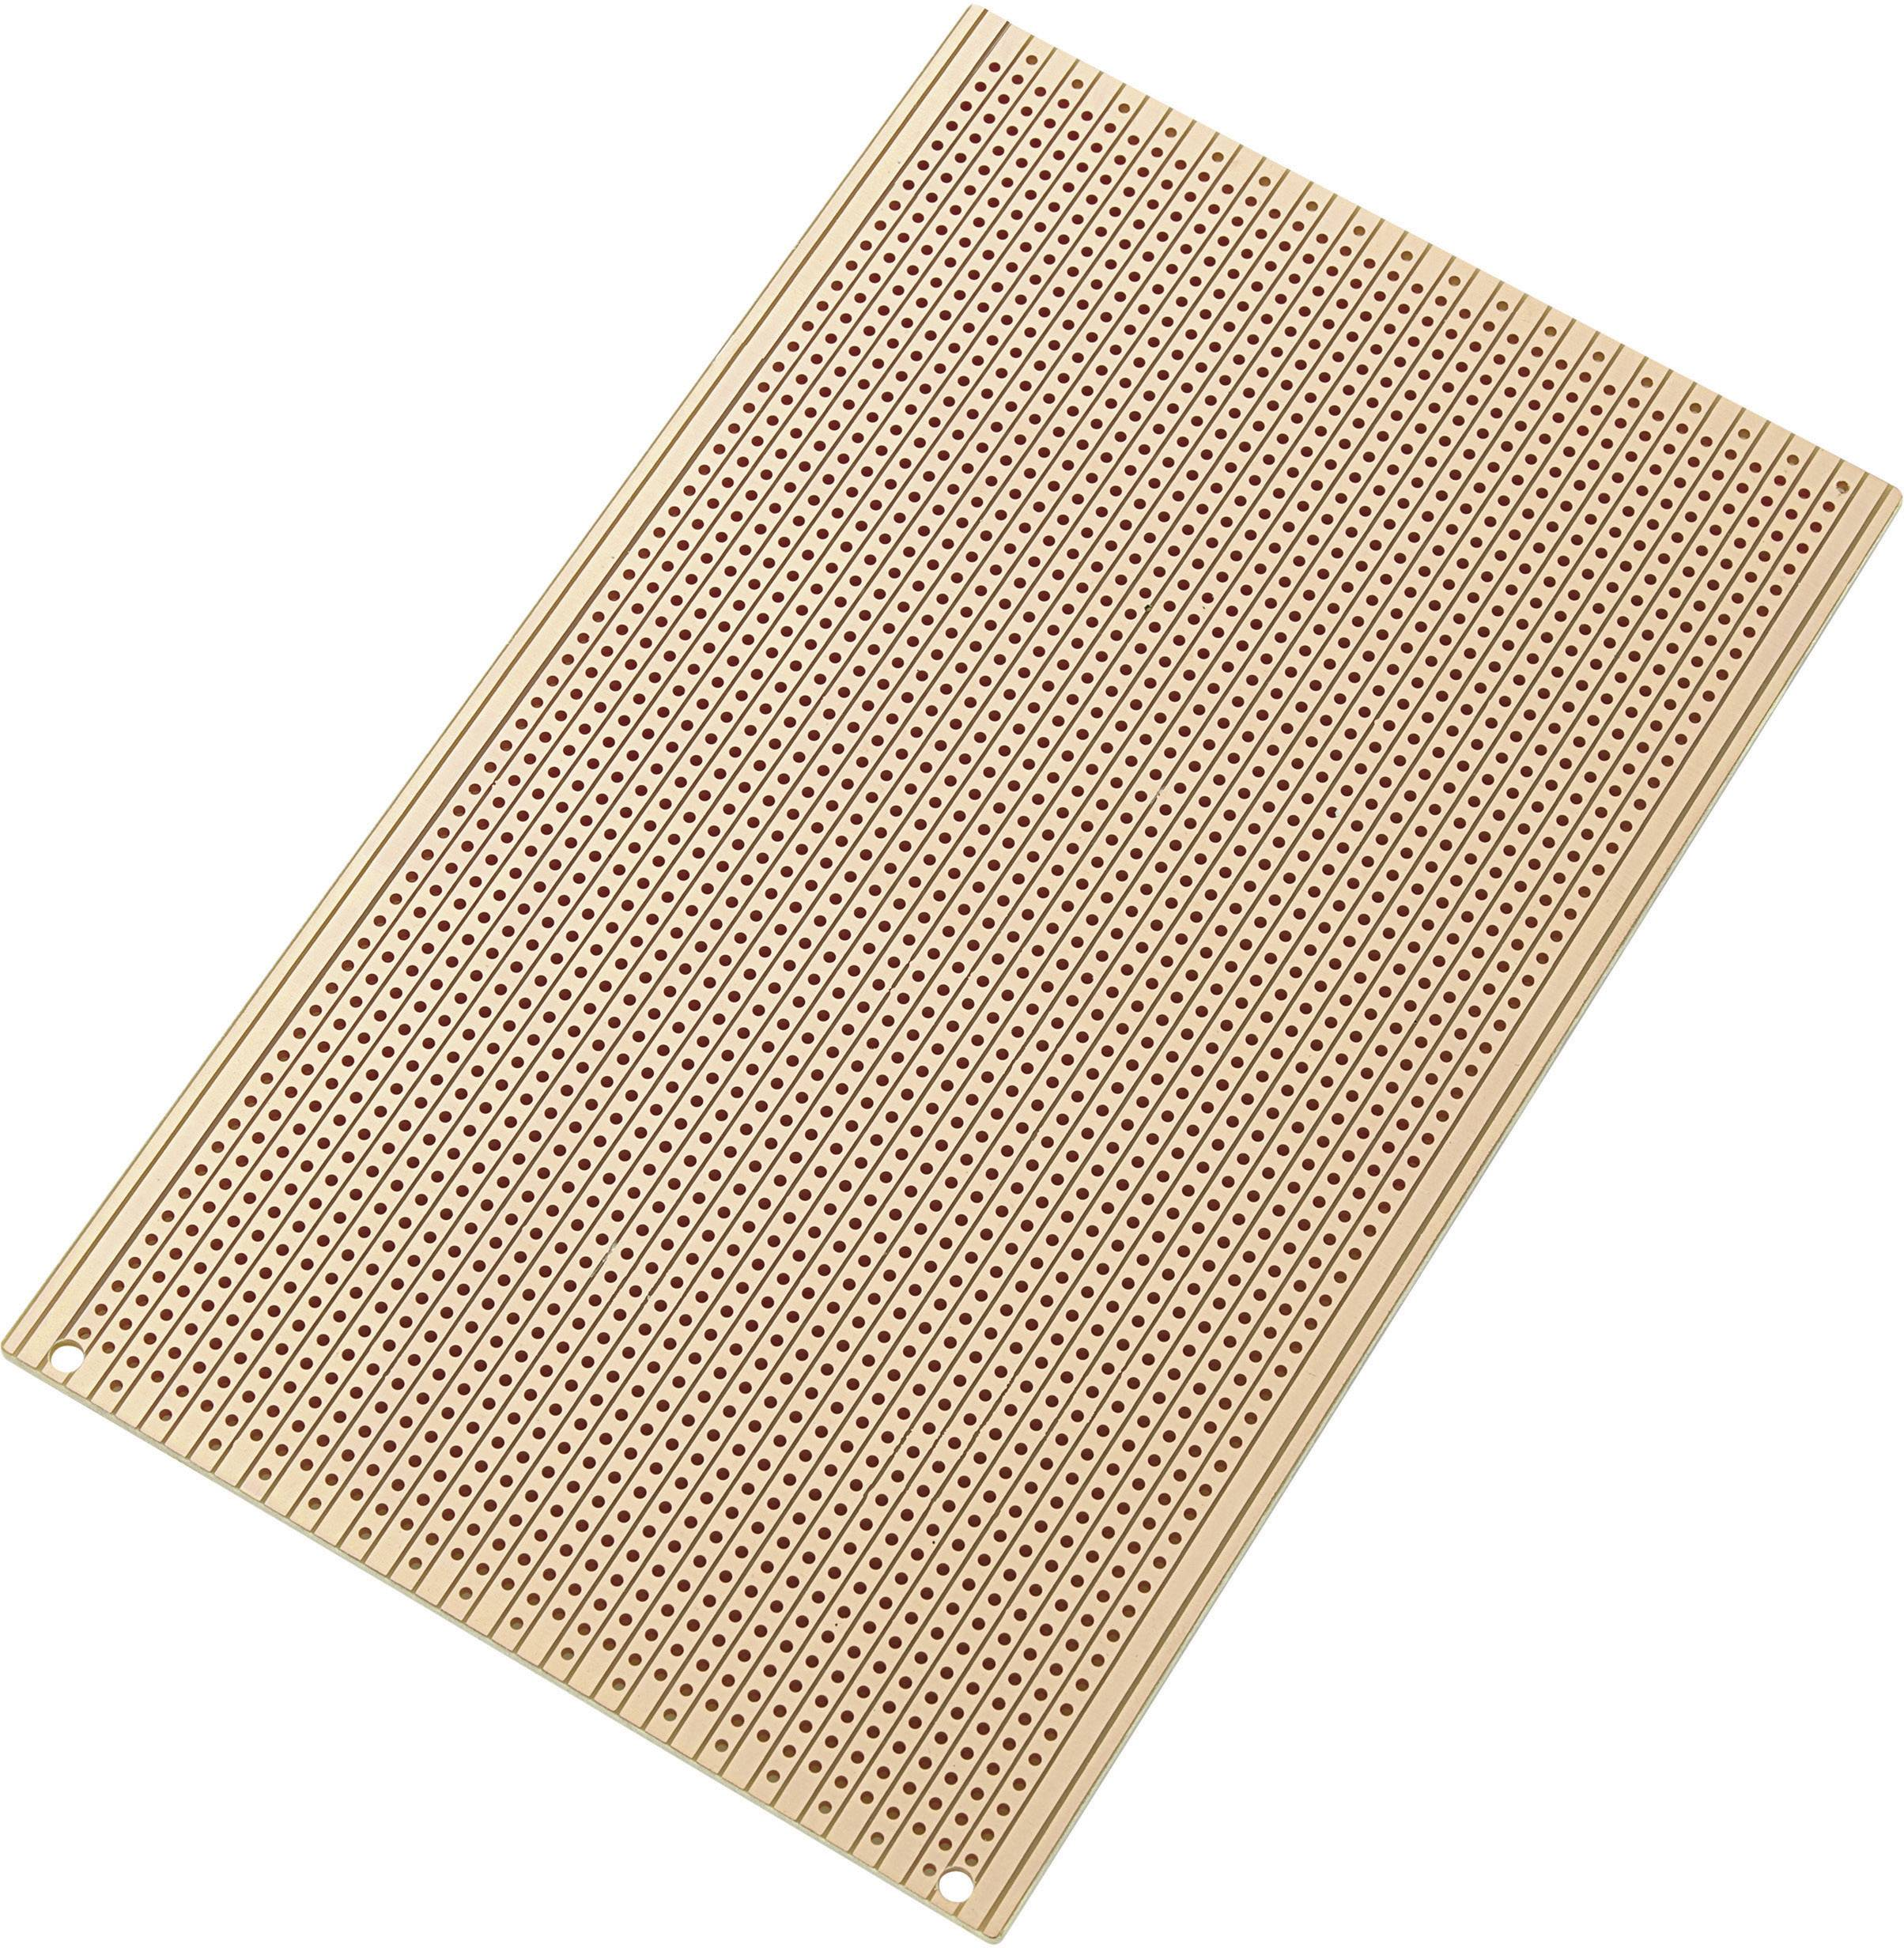 Eurodeska z tvrdého papíru, SU527556, (D x Š) 160 mm x 100 mm, velikost rastru 2,54 mm